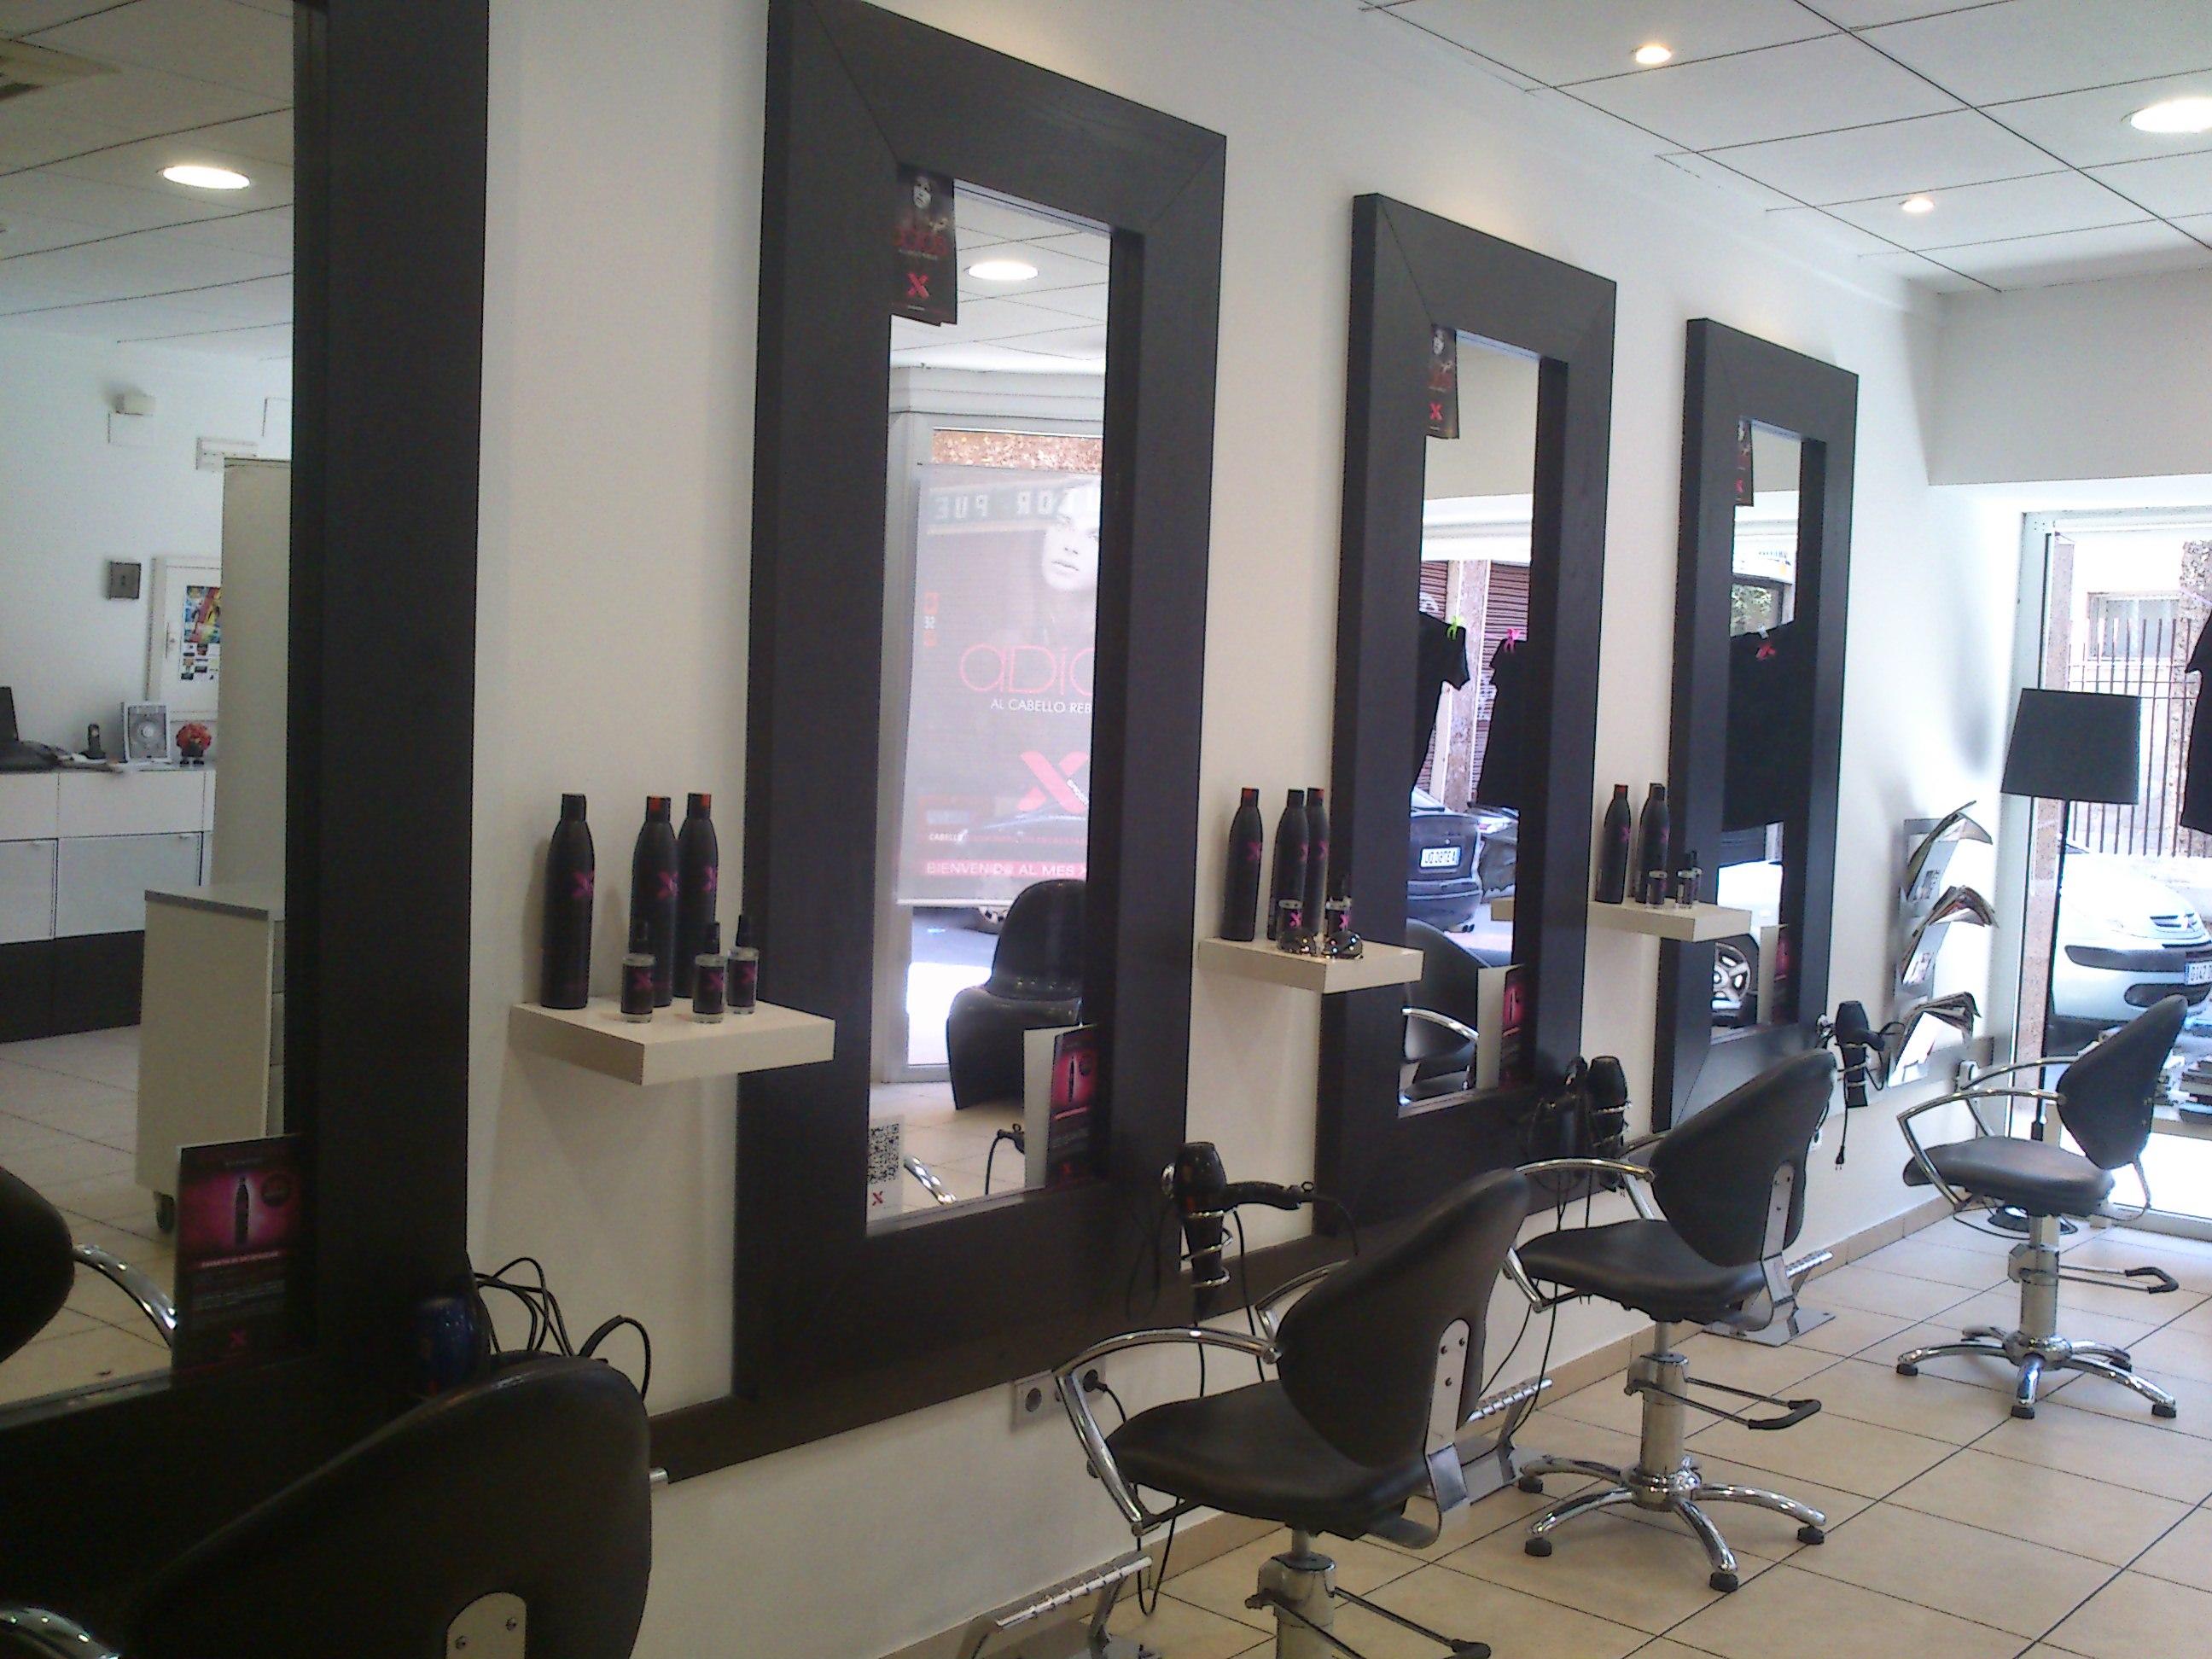 Peluqueros nanomaxblog - Salones de peluqueria decoracion fotos ...